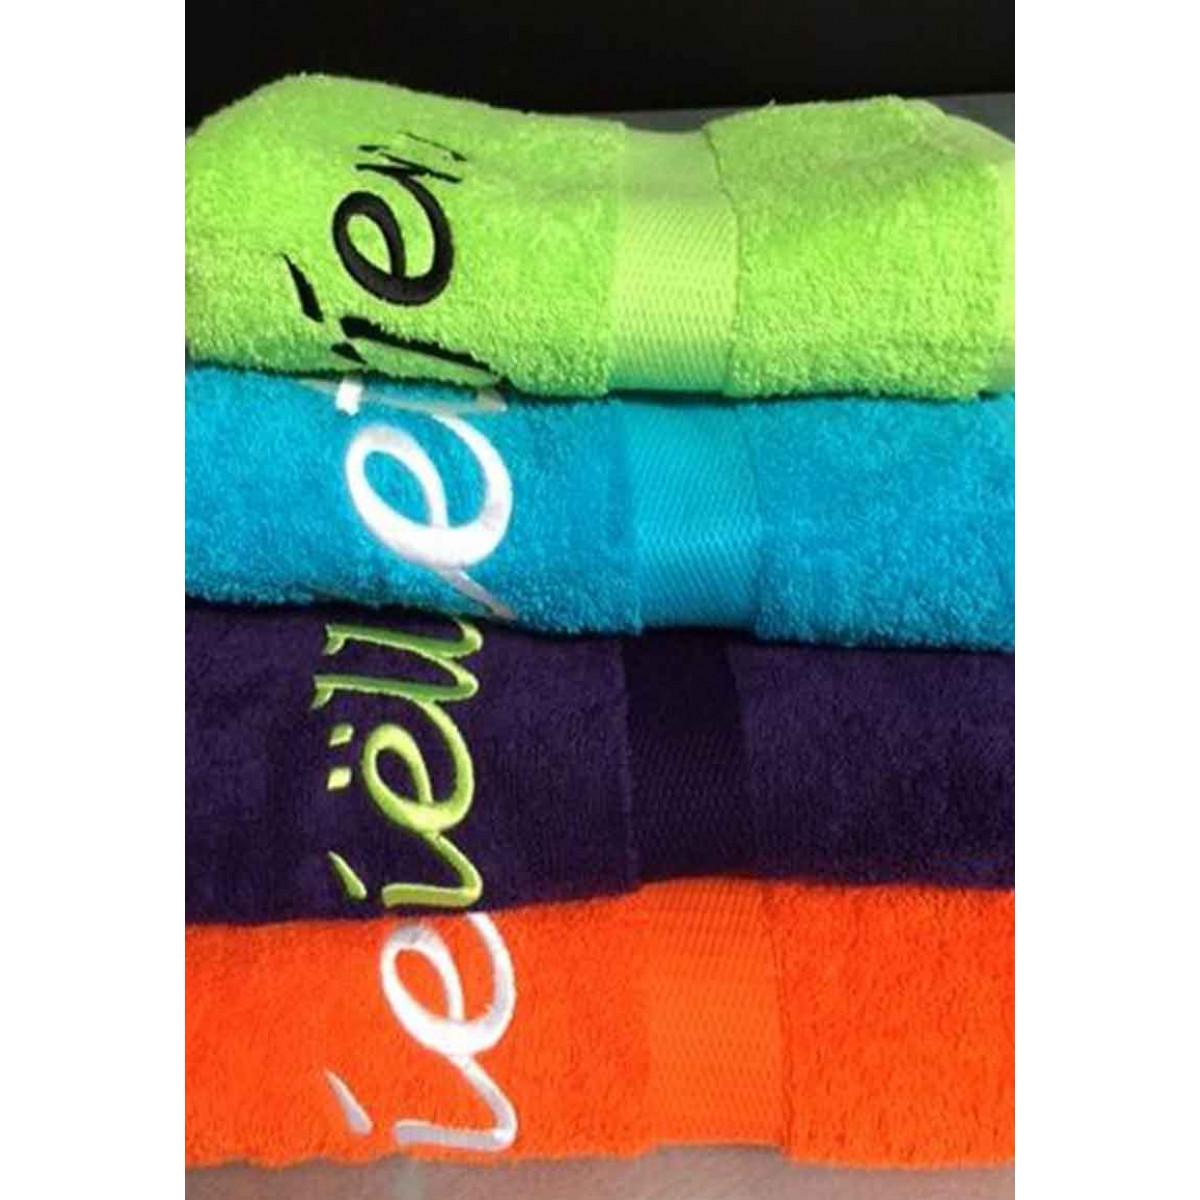 Handtücher besticken mit namen